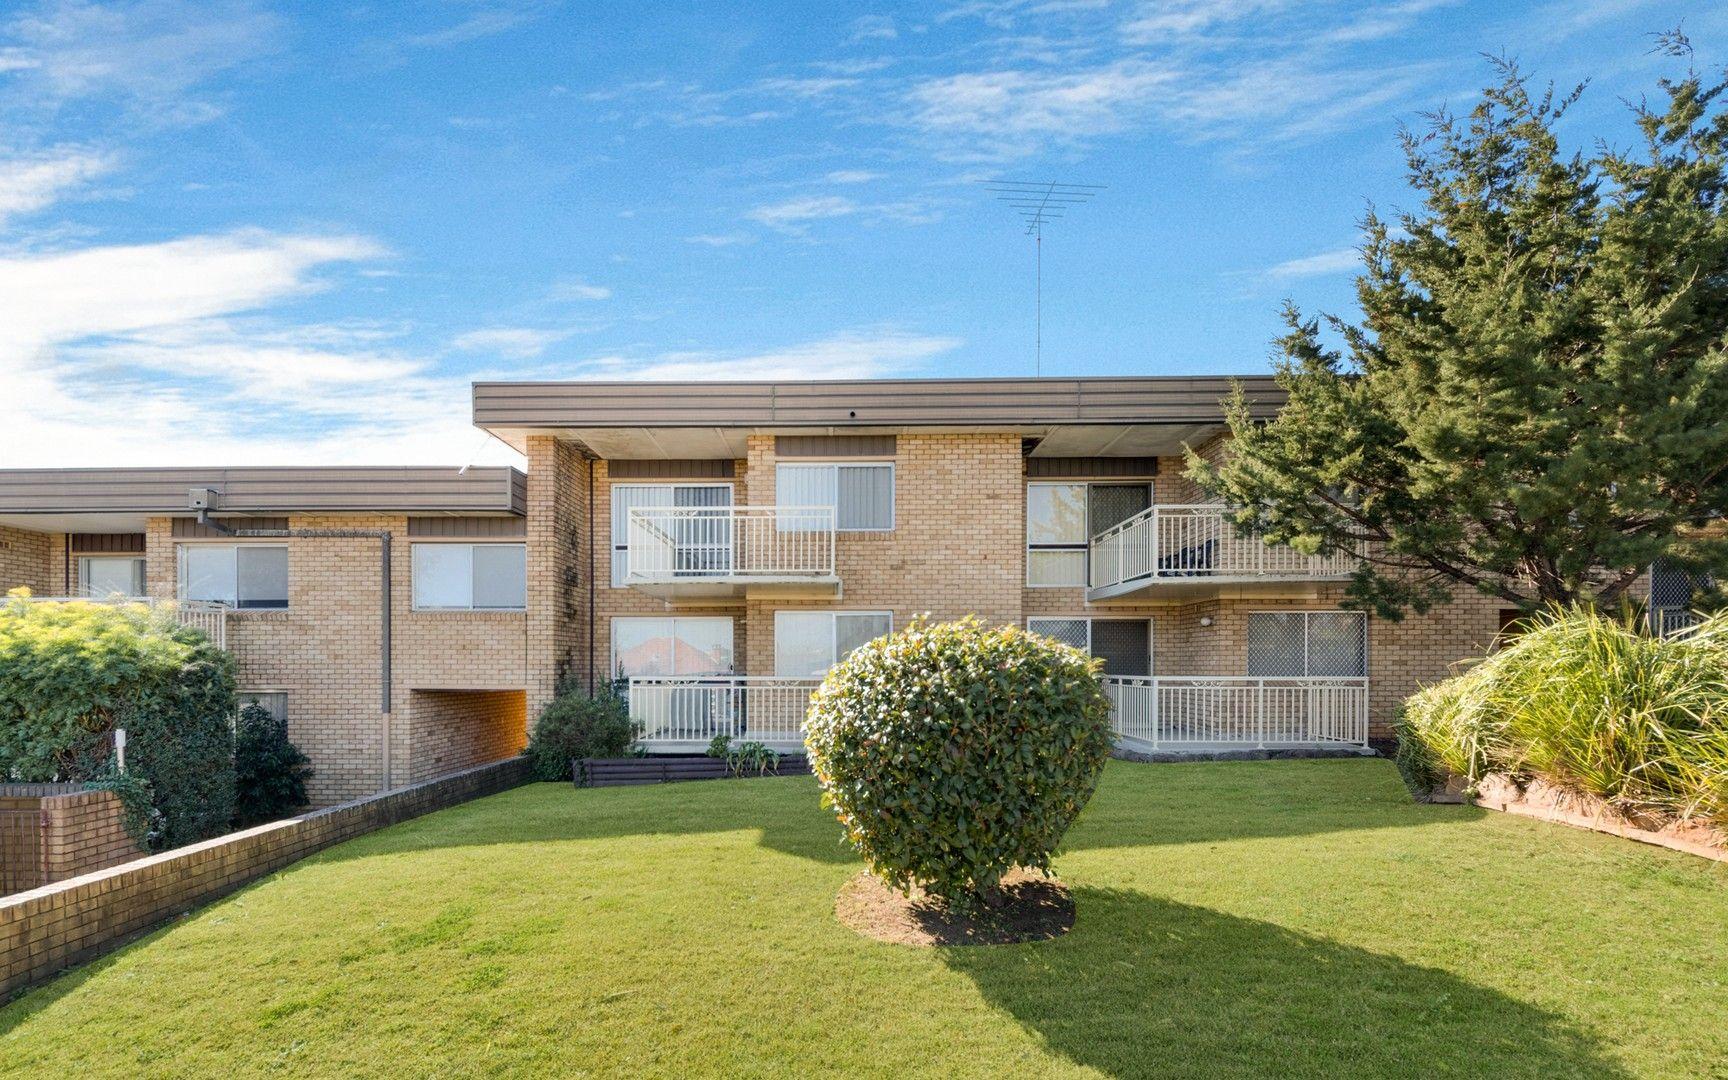 13/20-30 Condamine Street, Campbelltown NSW 2560, Image 0